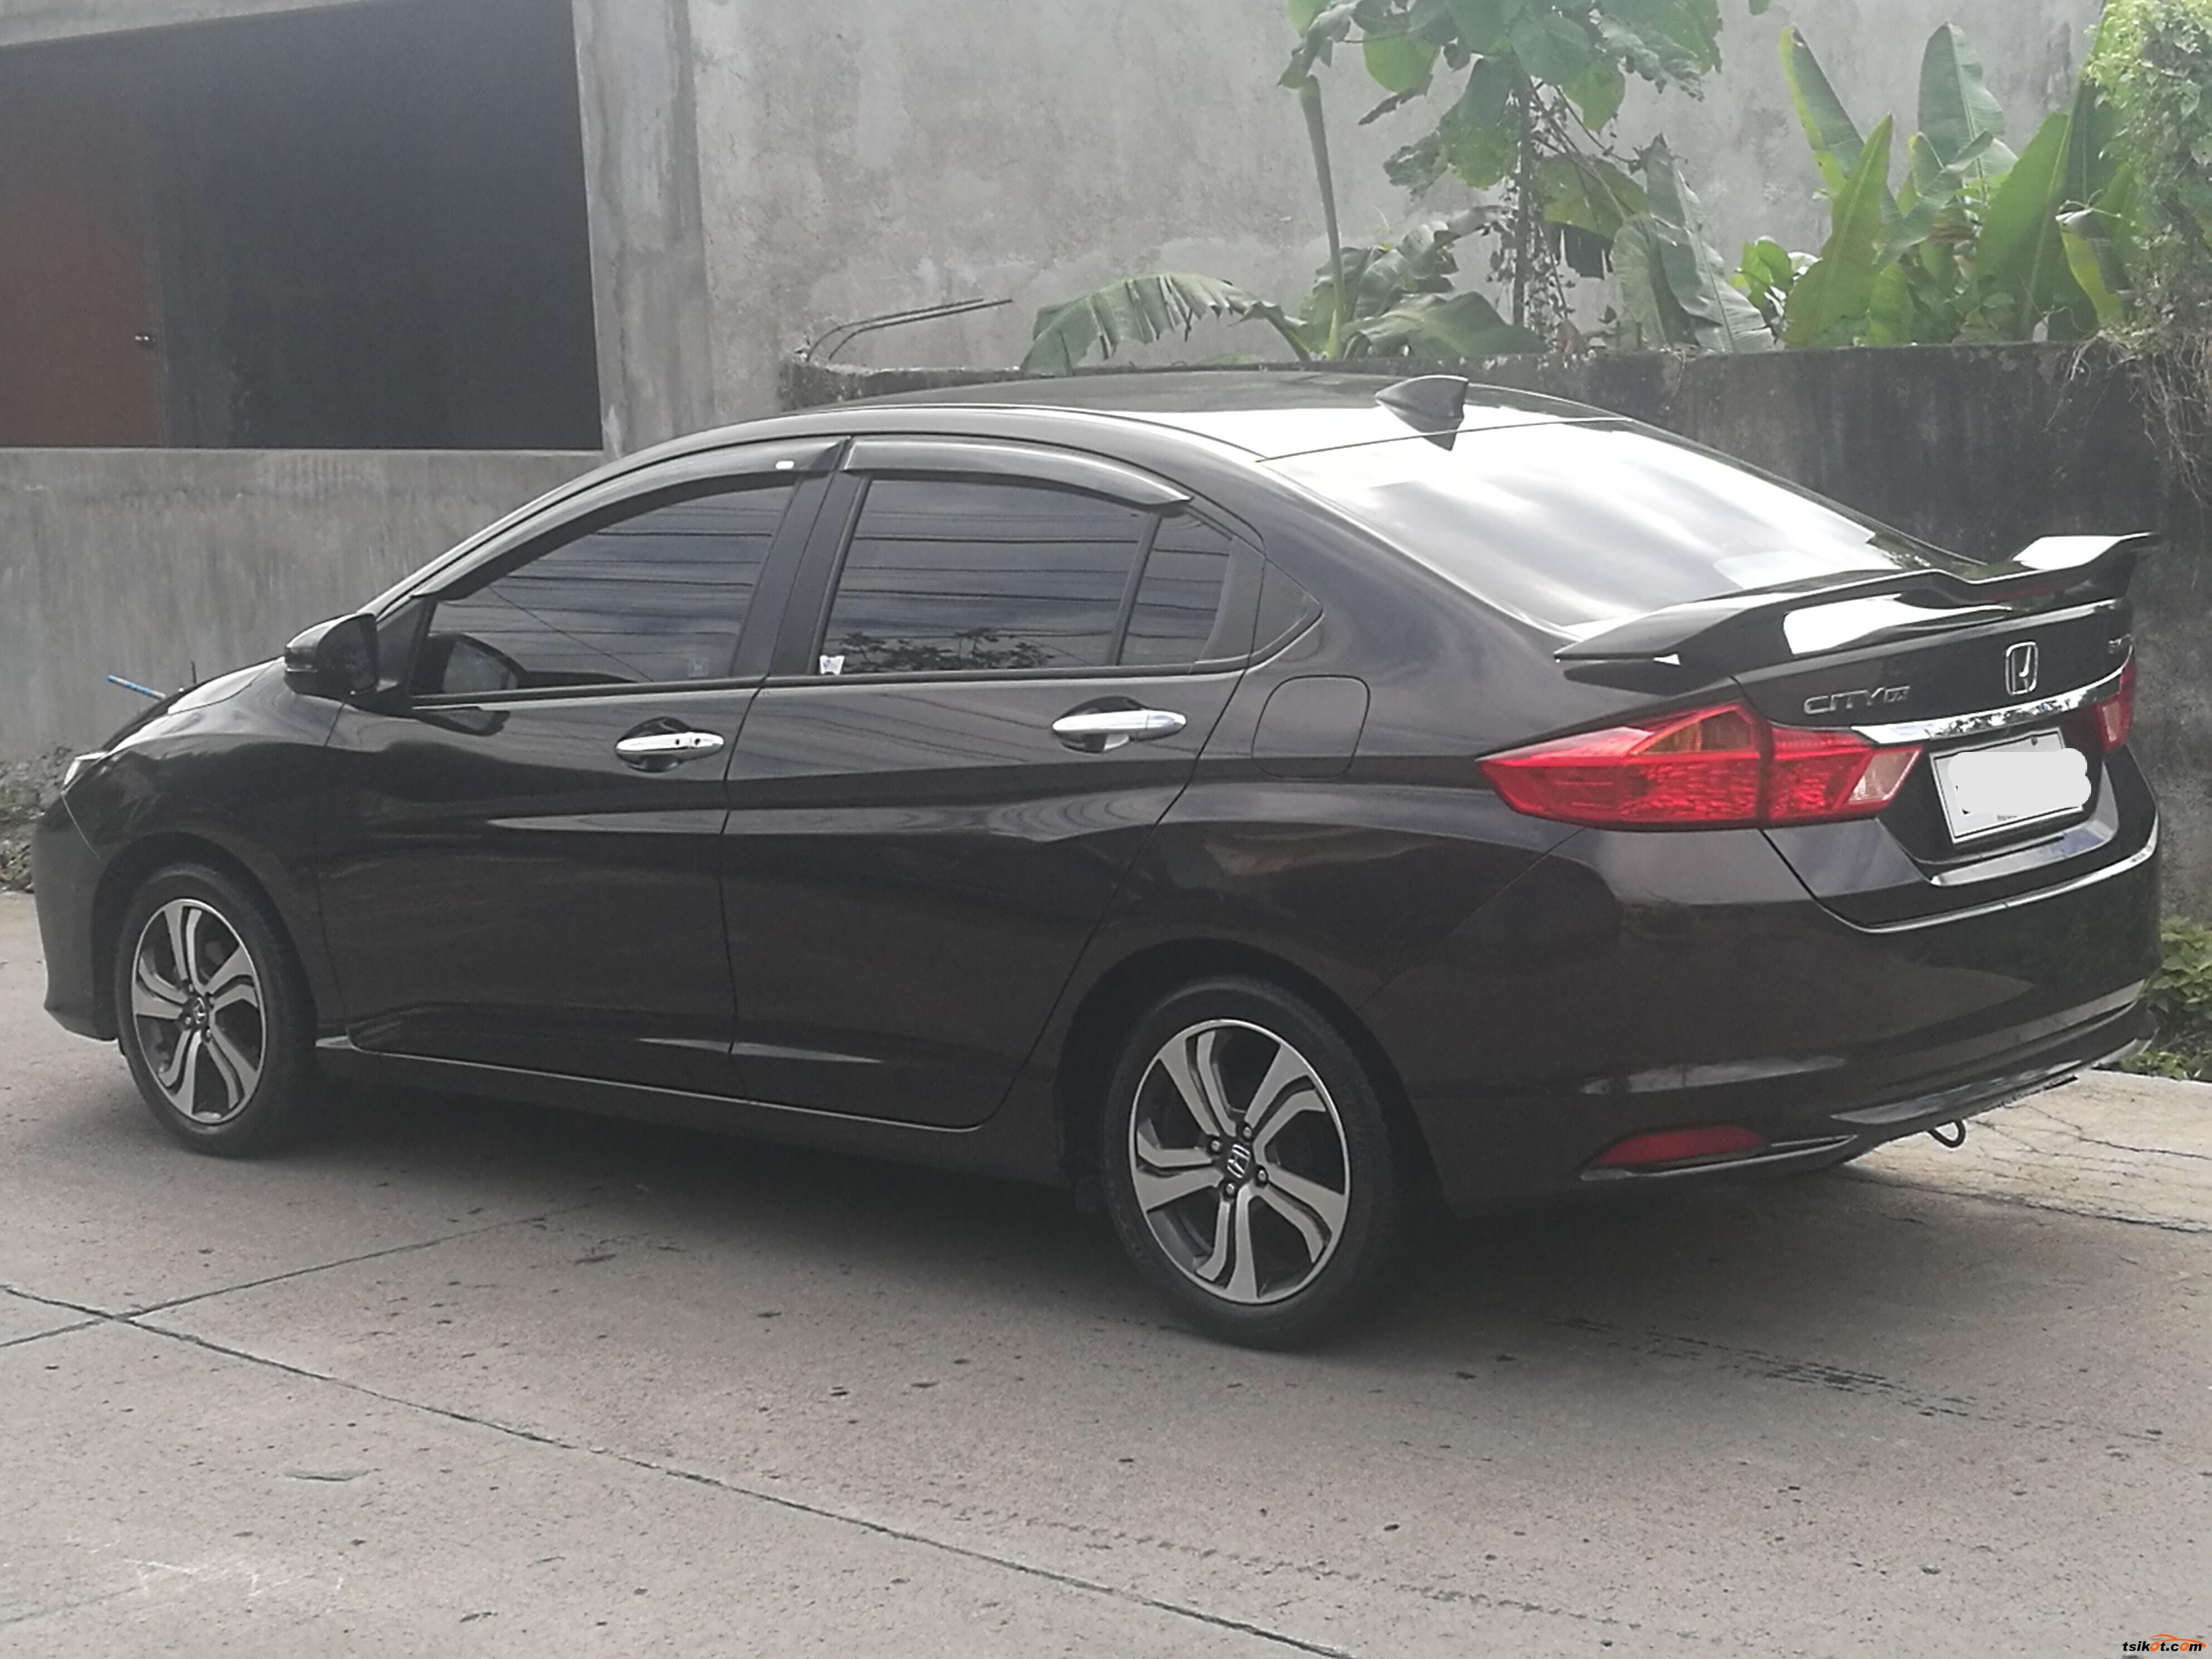 Honda City 2015 - Car for Sale Metro Manila